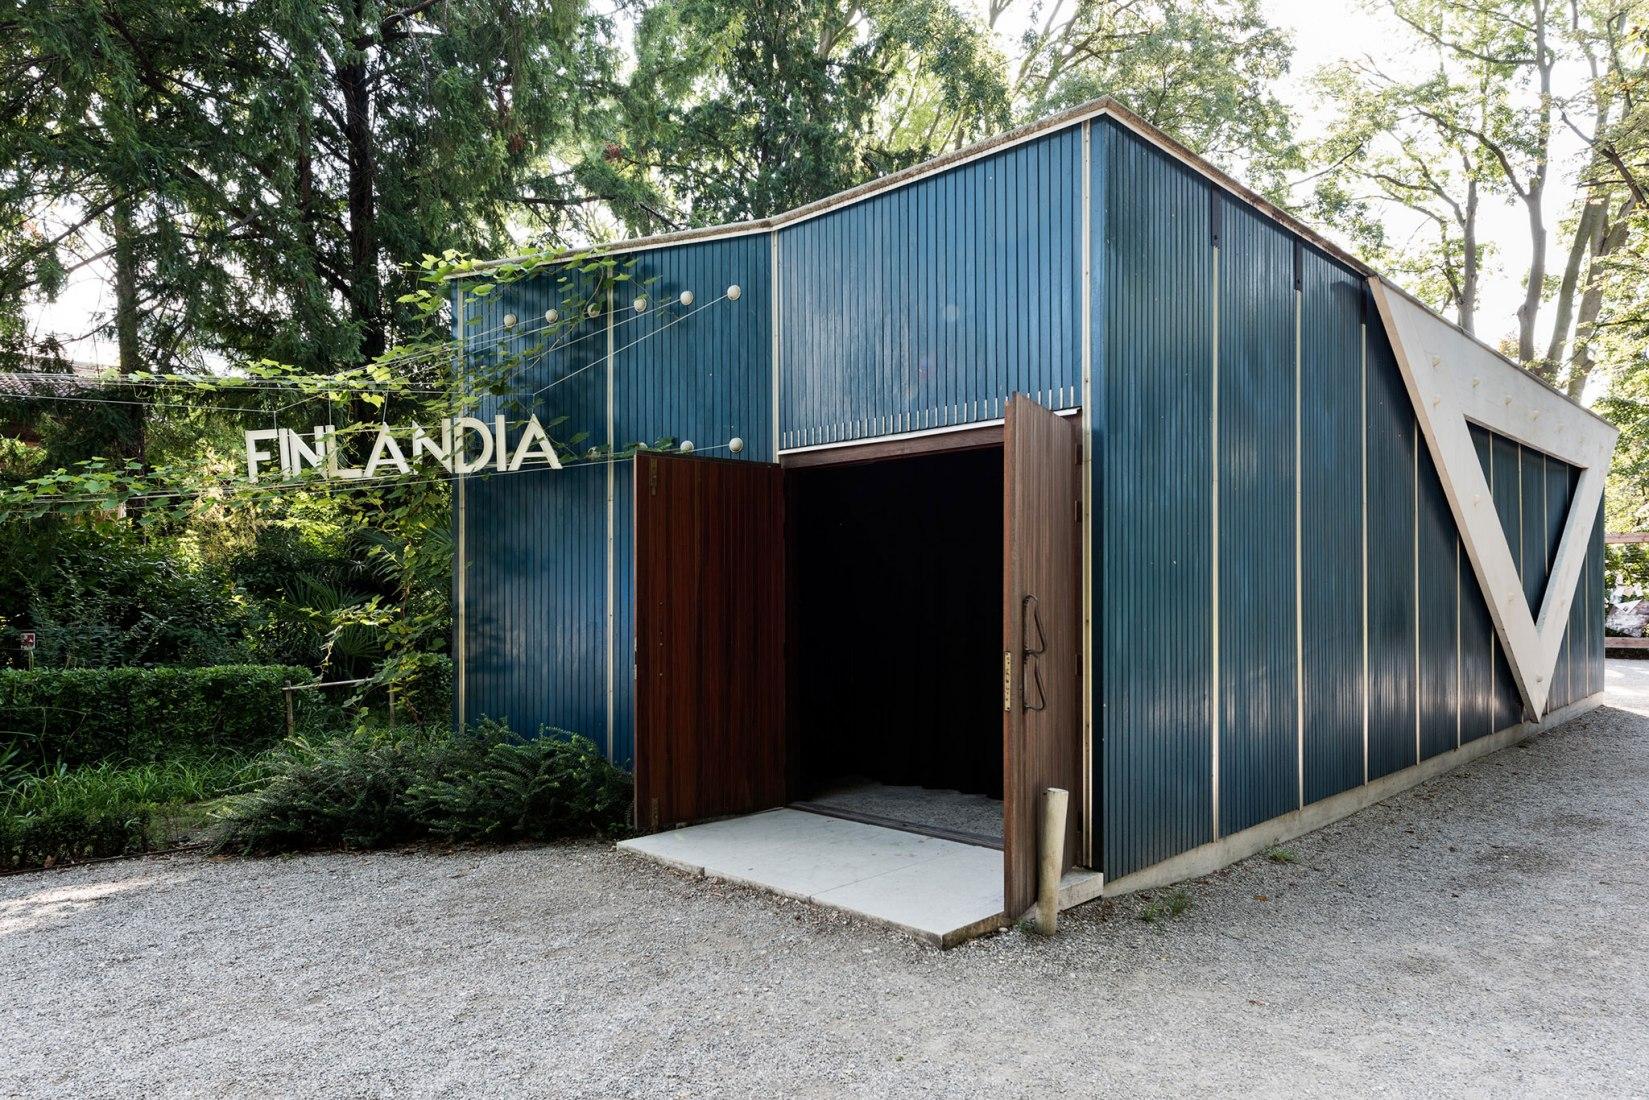 The Alvar Aalto -designed Pavilion of Finland in the Giardini, Venice. Photograph by Ugo Carmeni